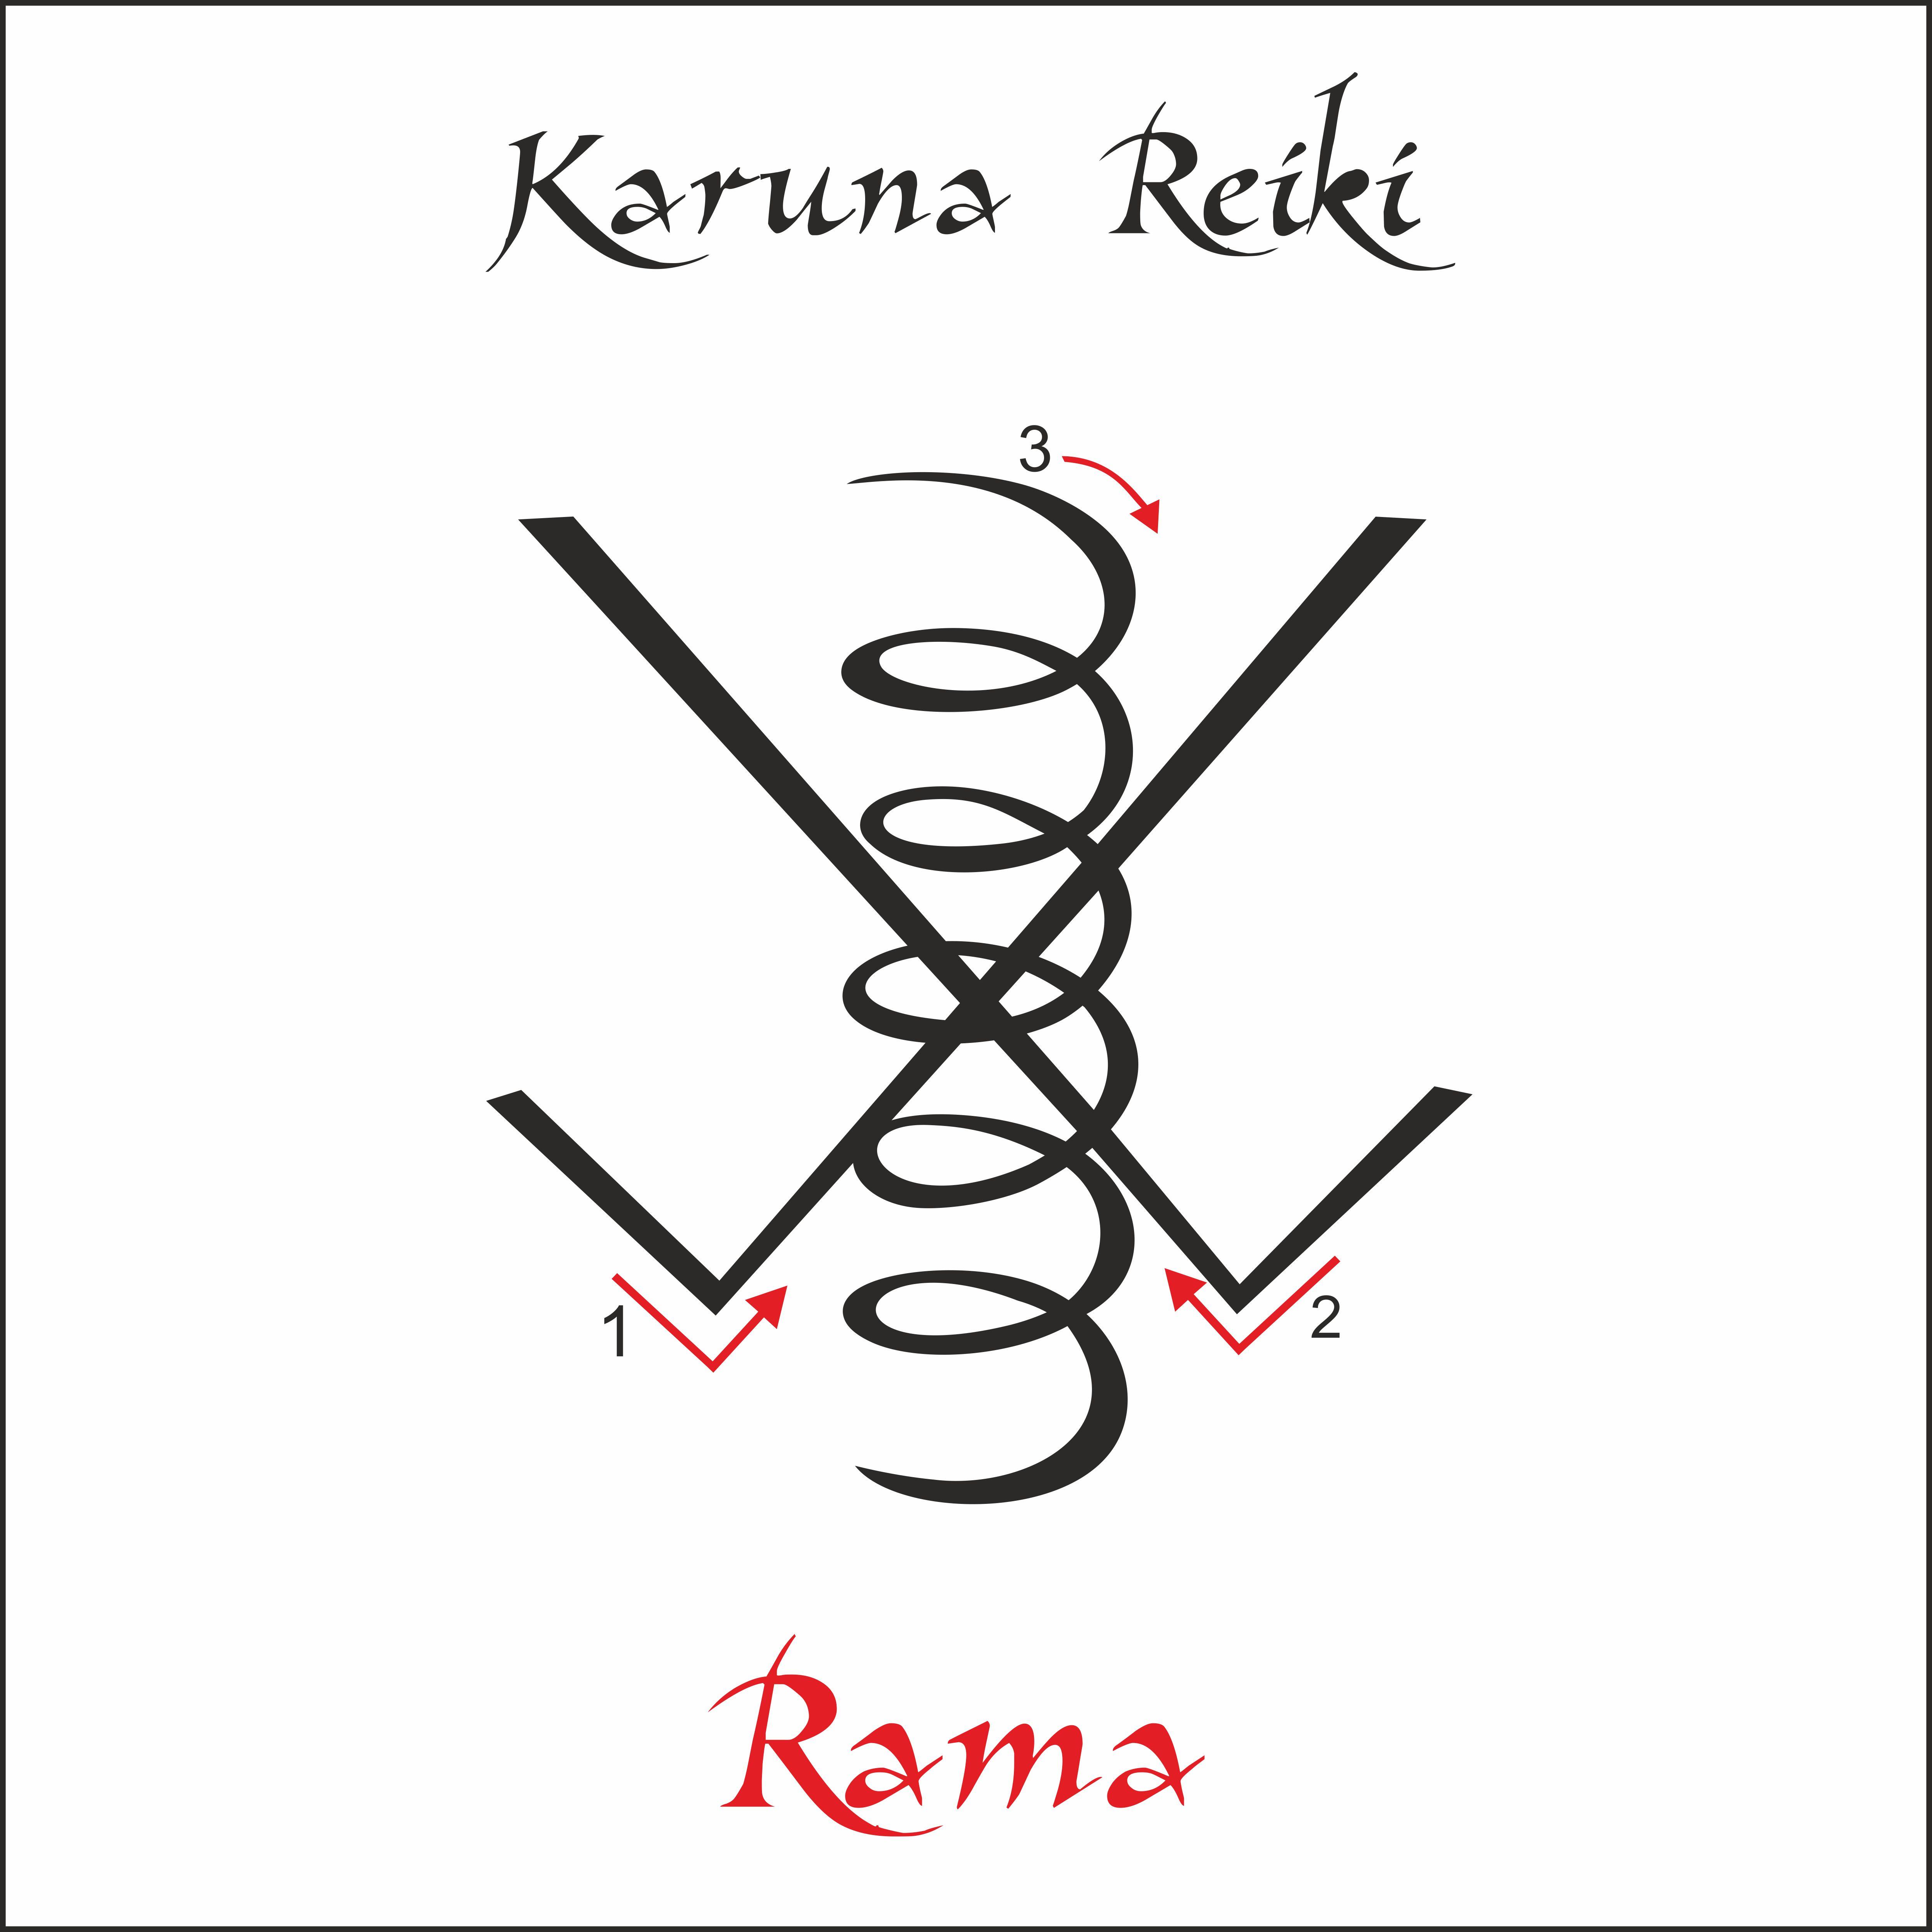 Karuna Reiki. Energy healing. Alternative medicine. Rama